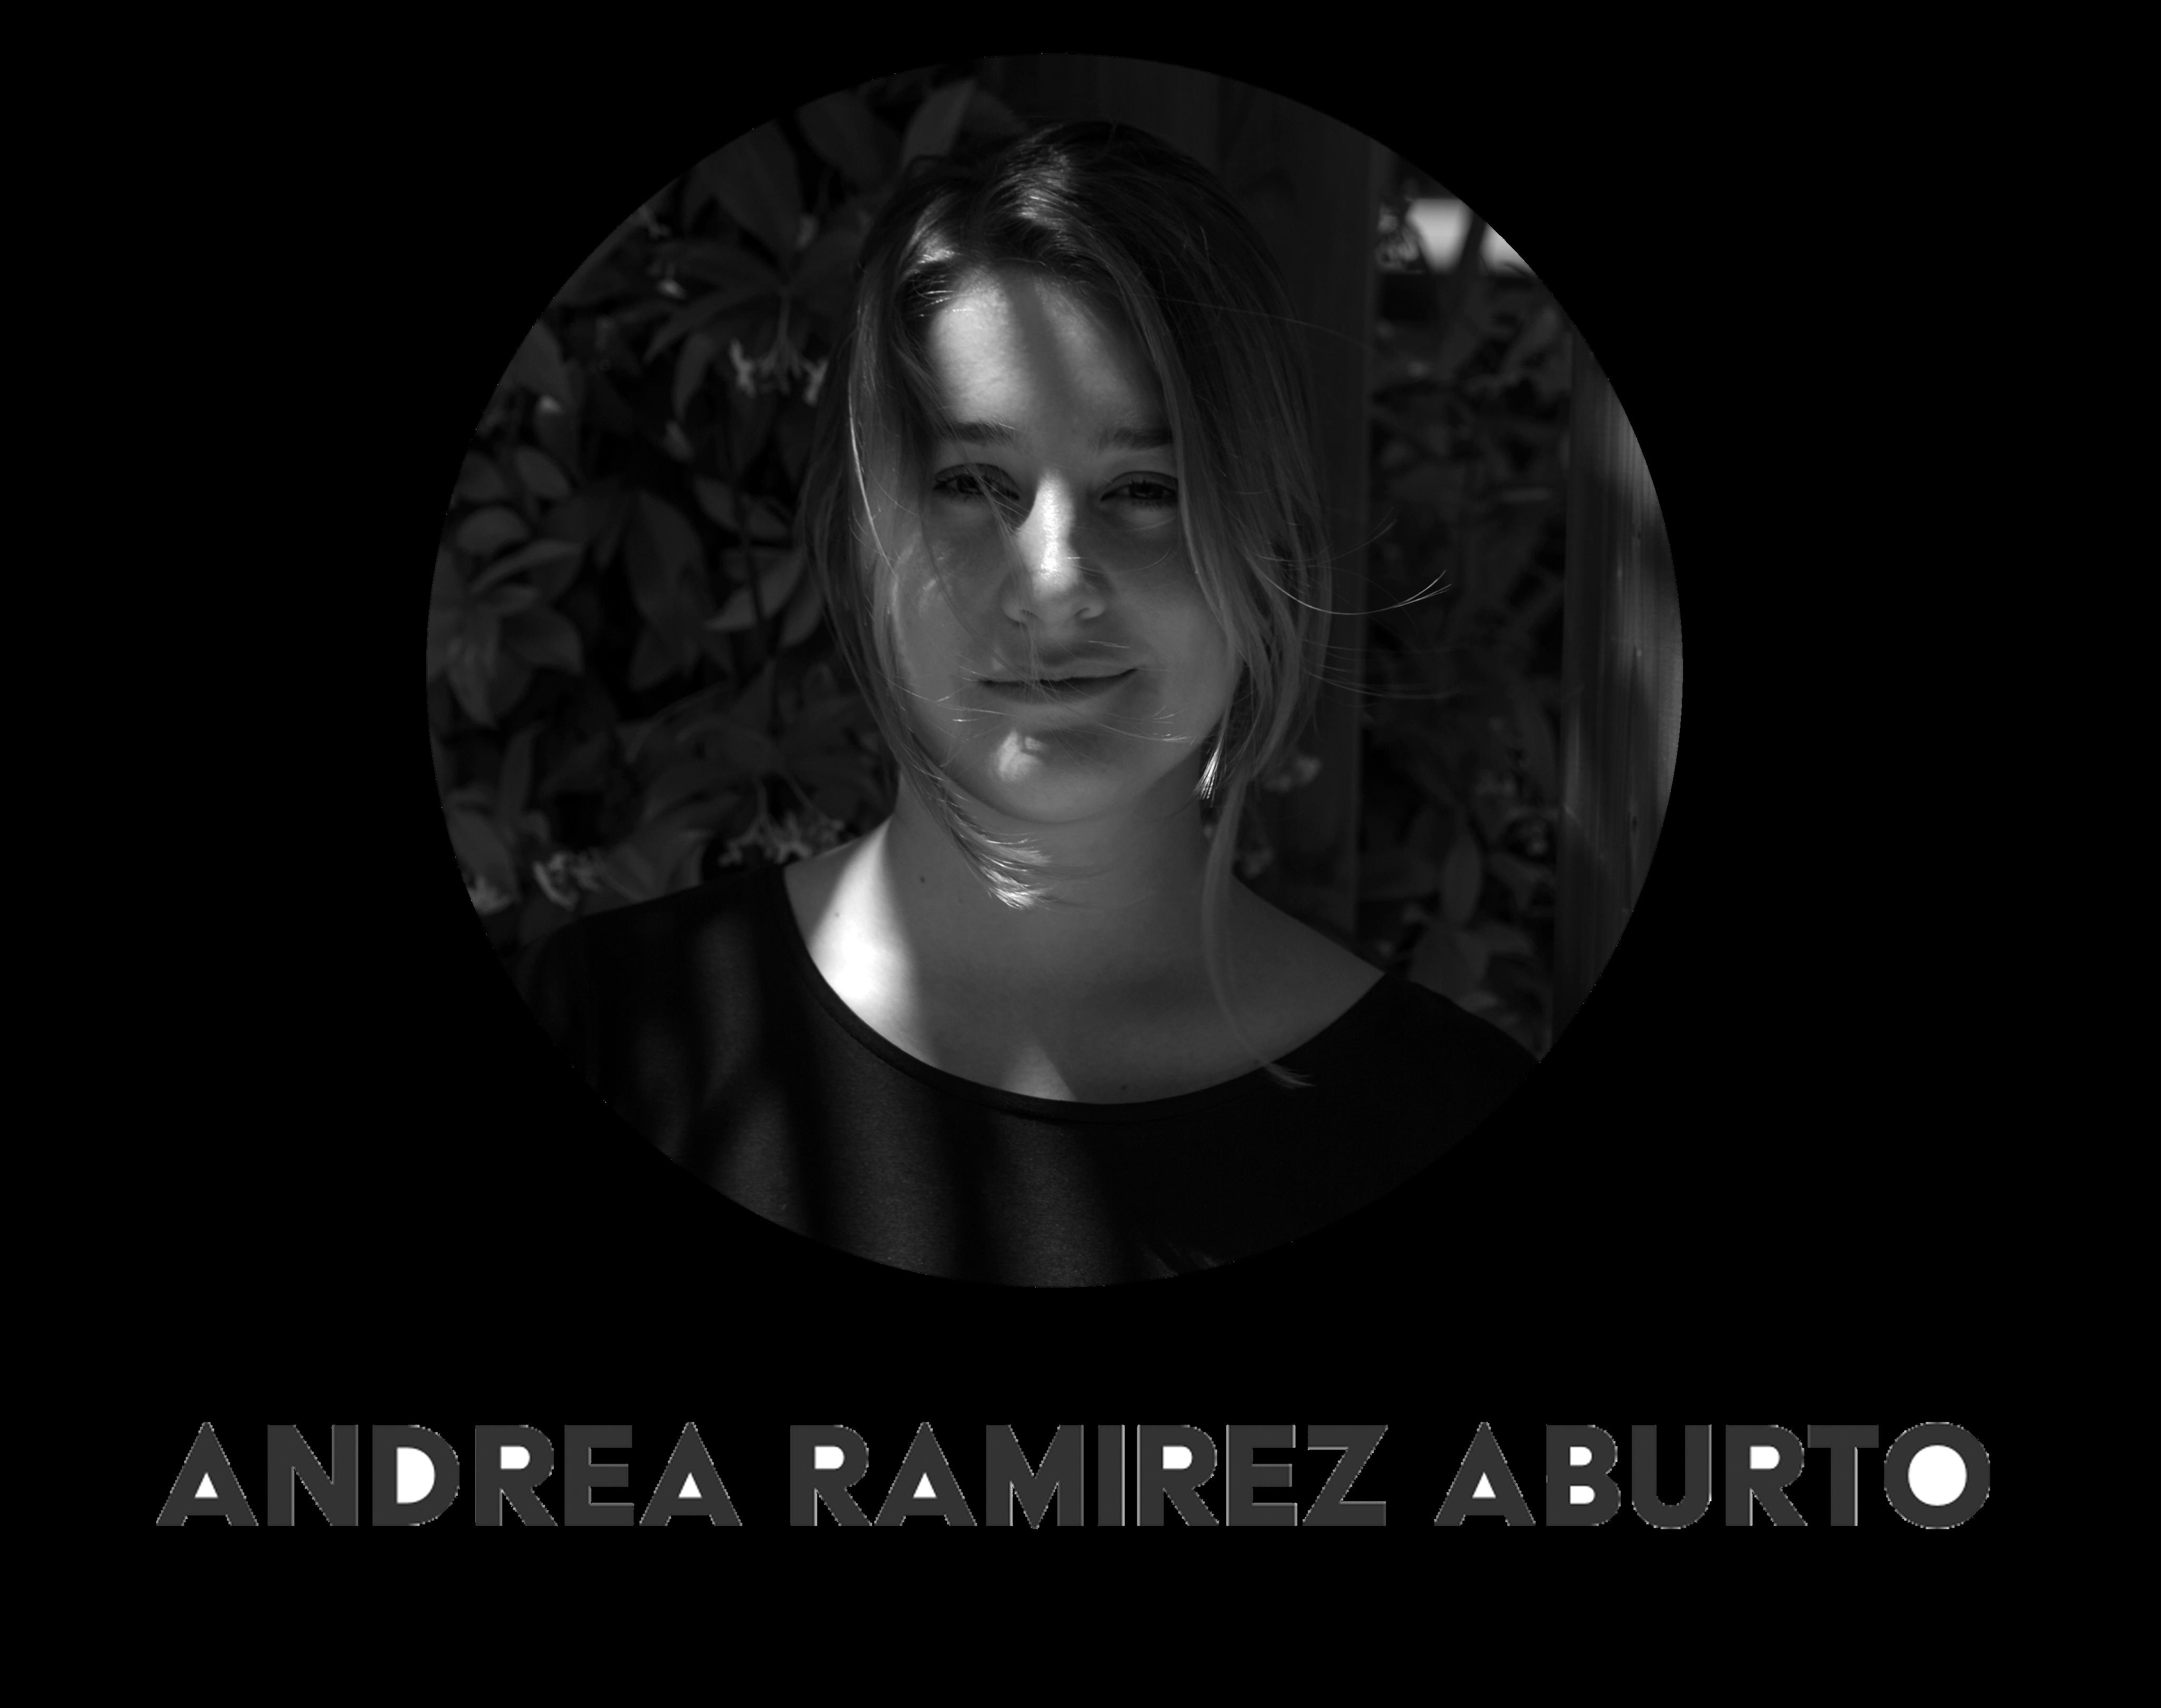 Andrea Ramirez A.